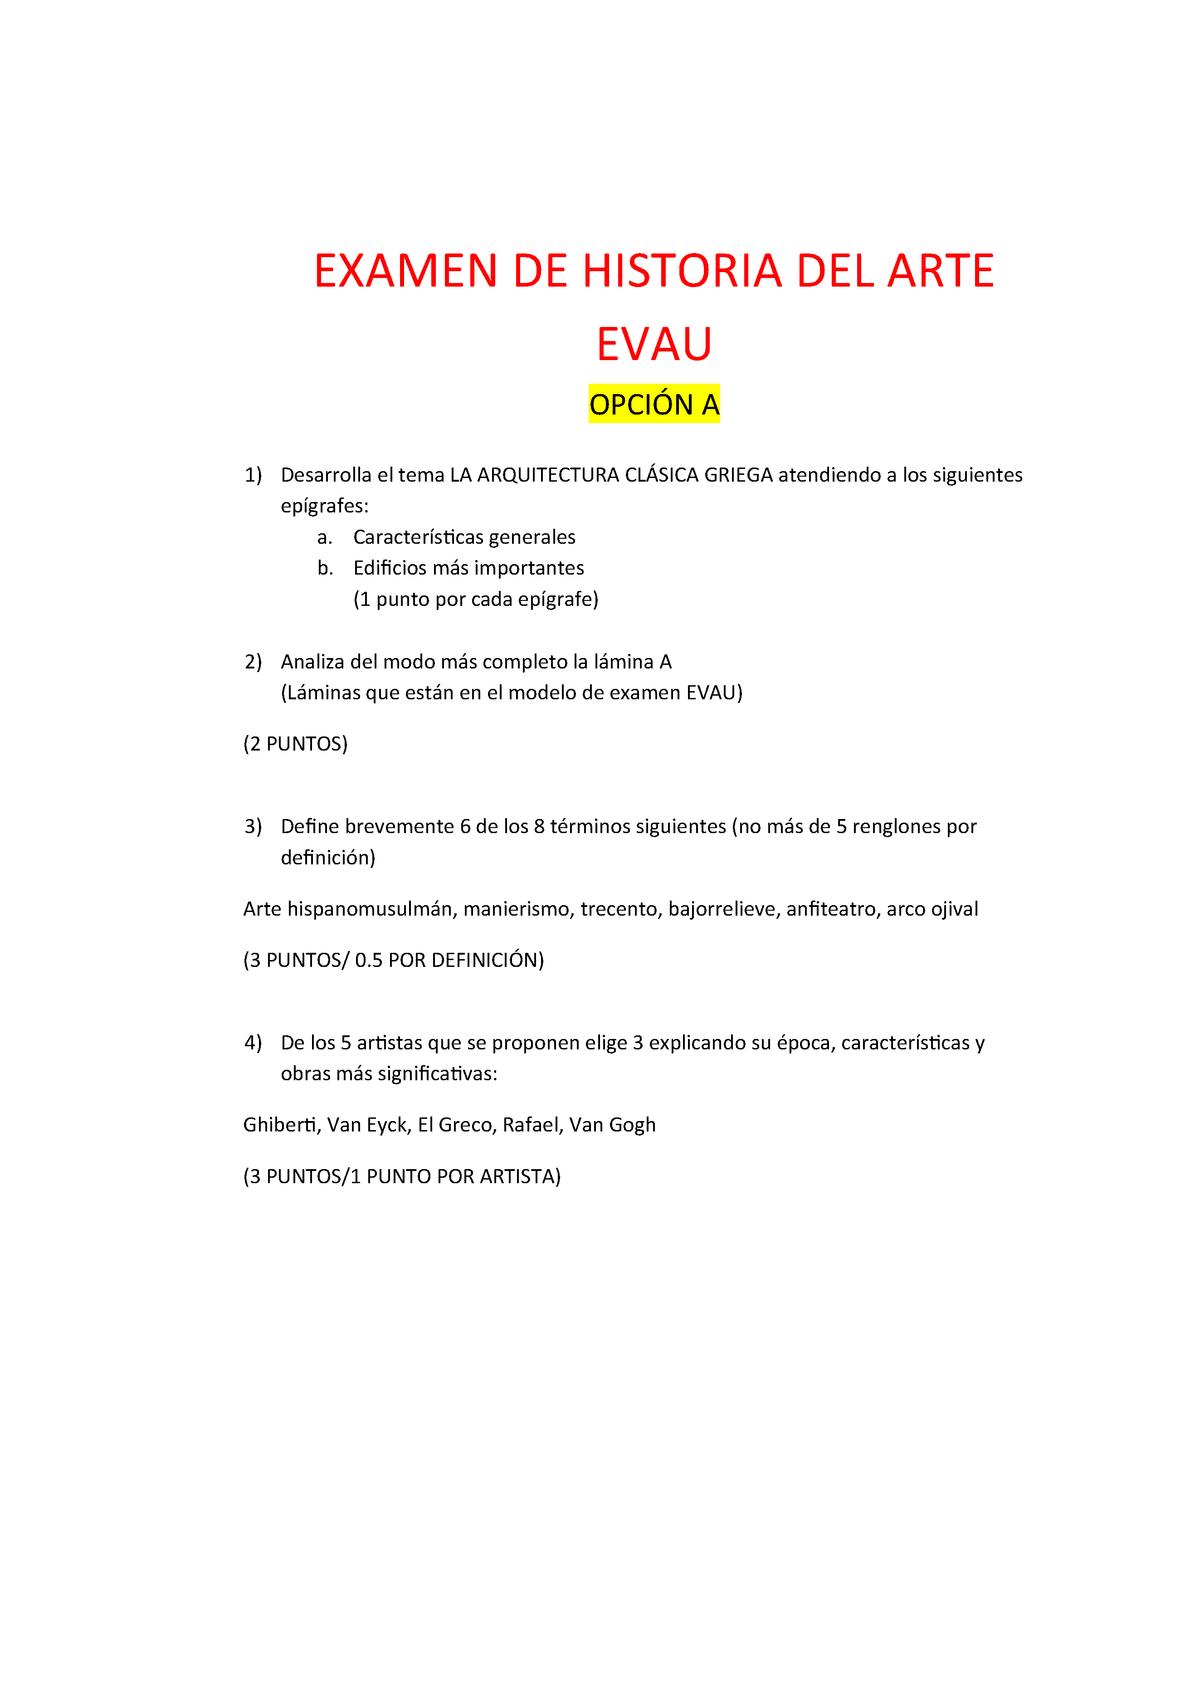 Examen De Evau S Historia Del Arte Studocu